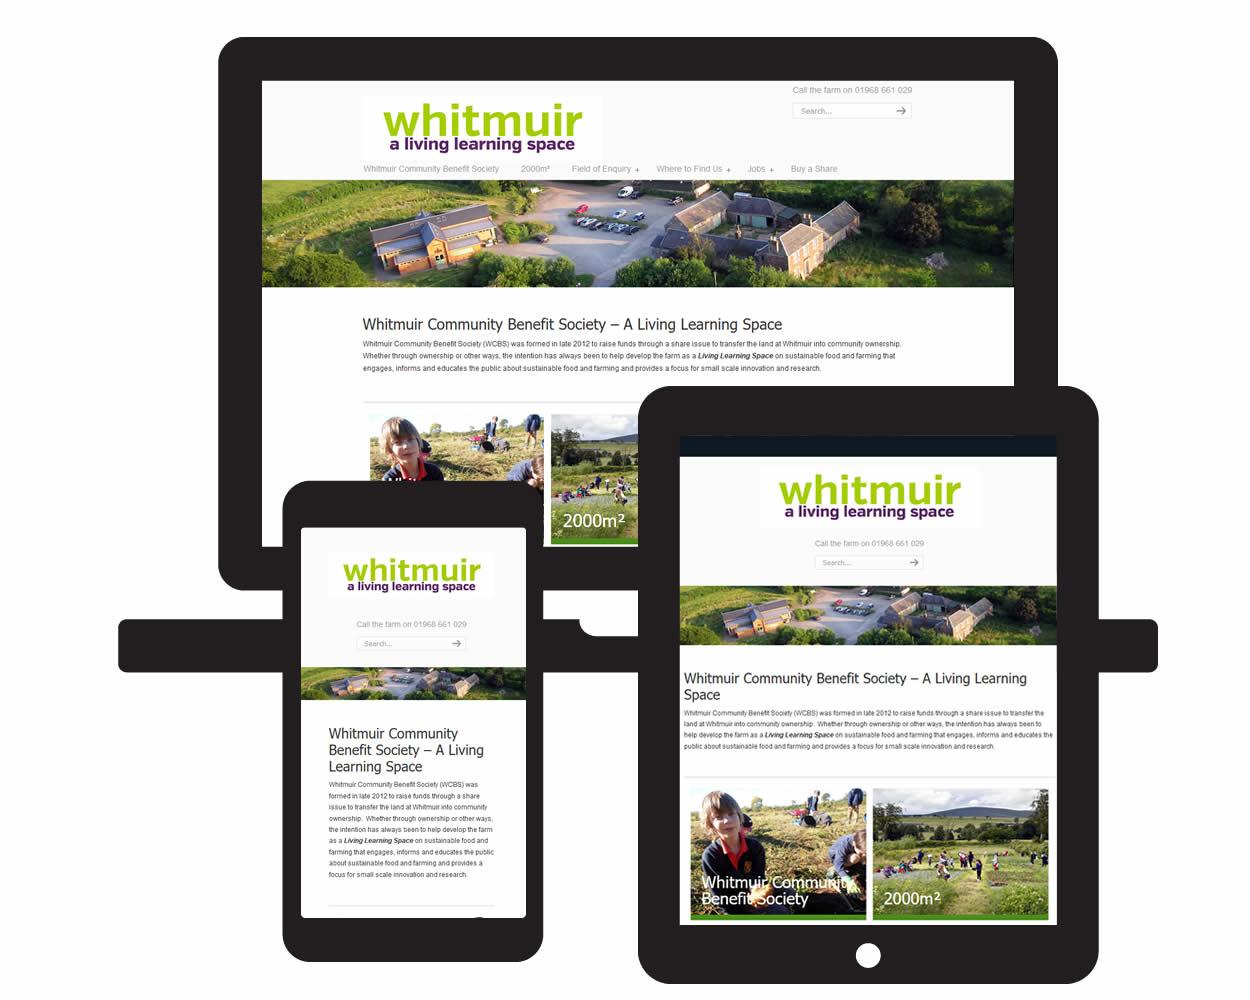 Screen visual of Whitmuir Community Farm